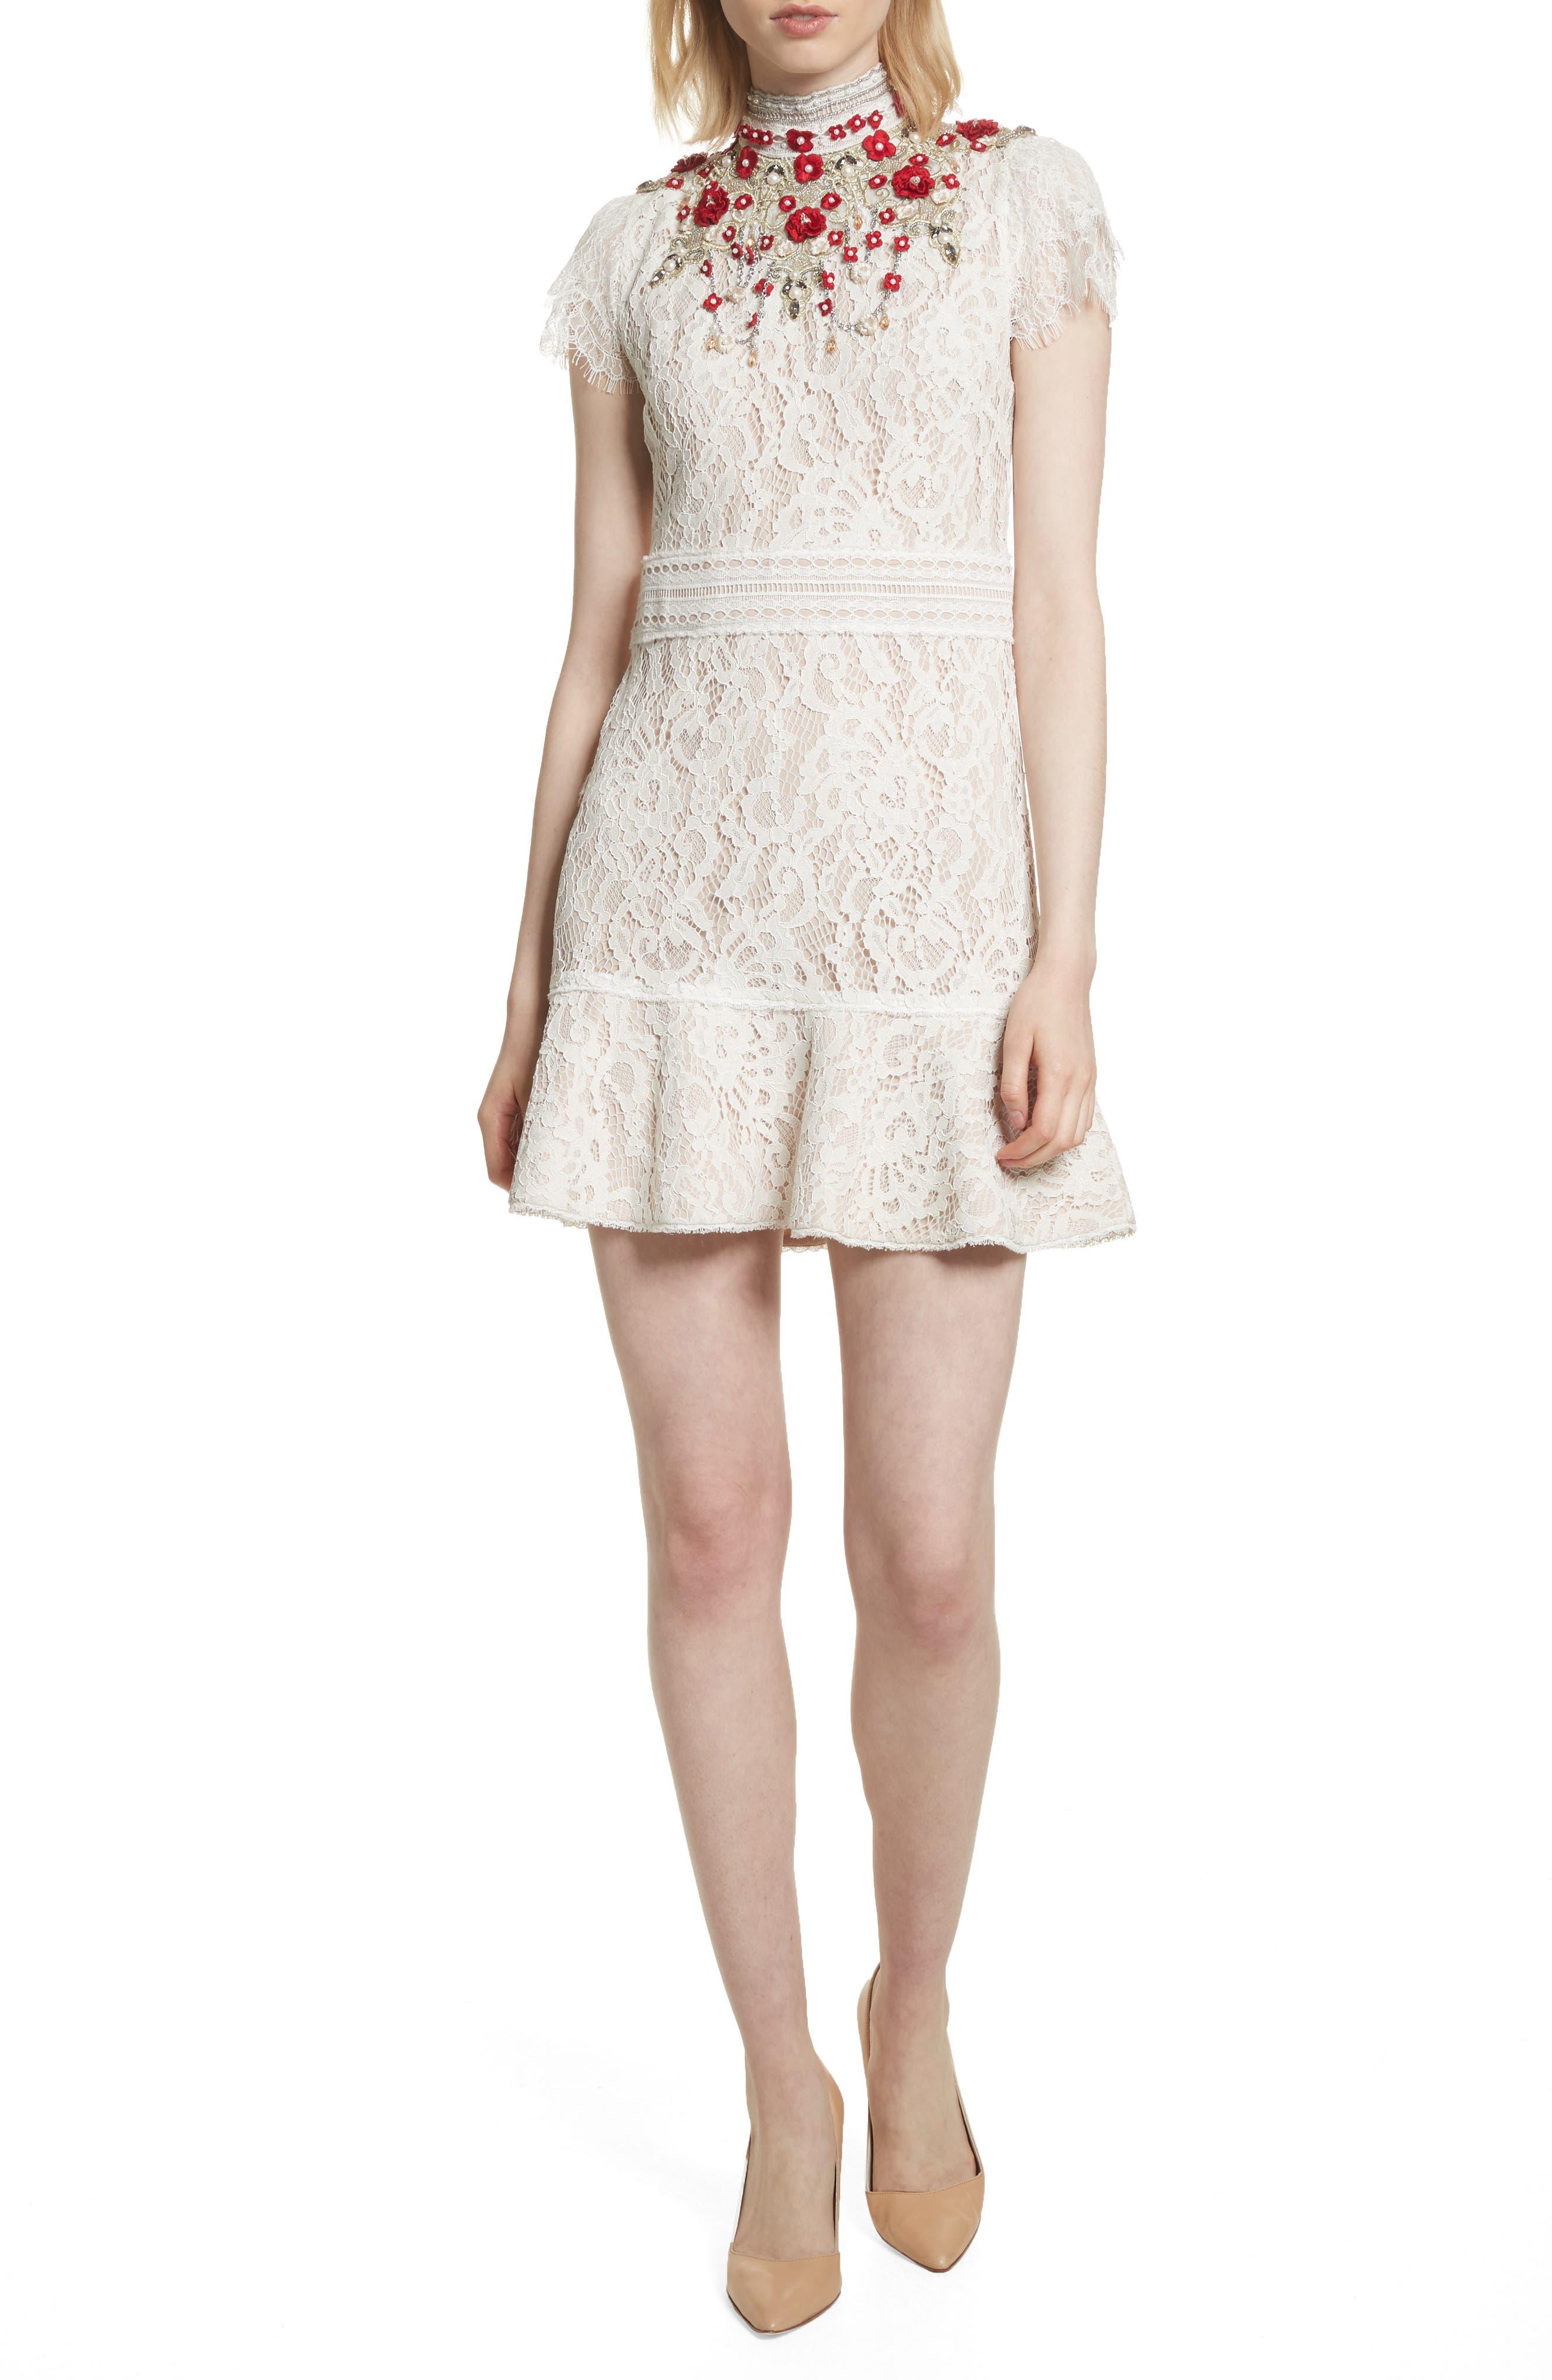 Alice+olivia Woman Embroidered Cotton Flared Minin Dress Mint Size 4 Alice & Olivia 0V0DeZ